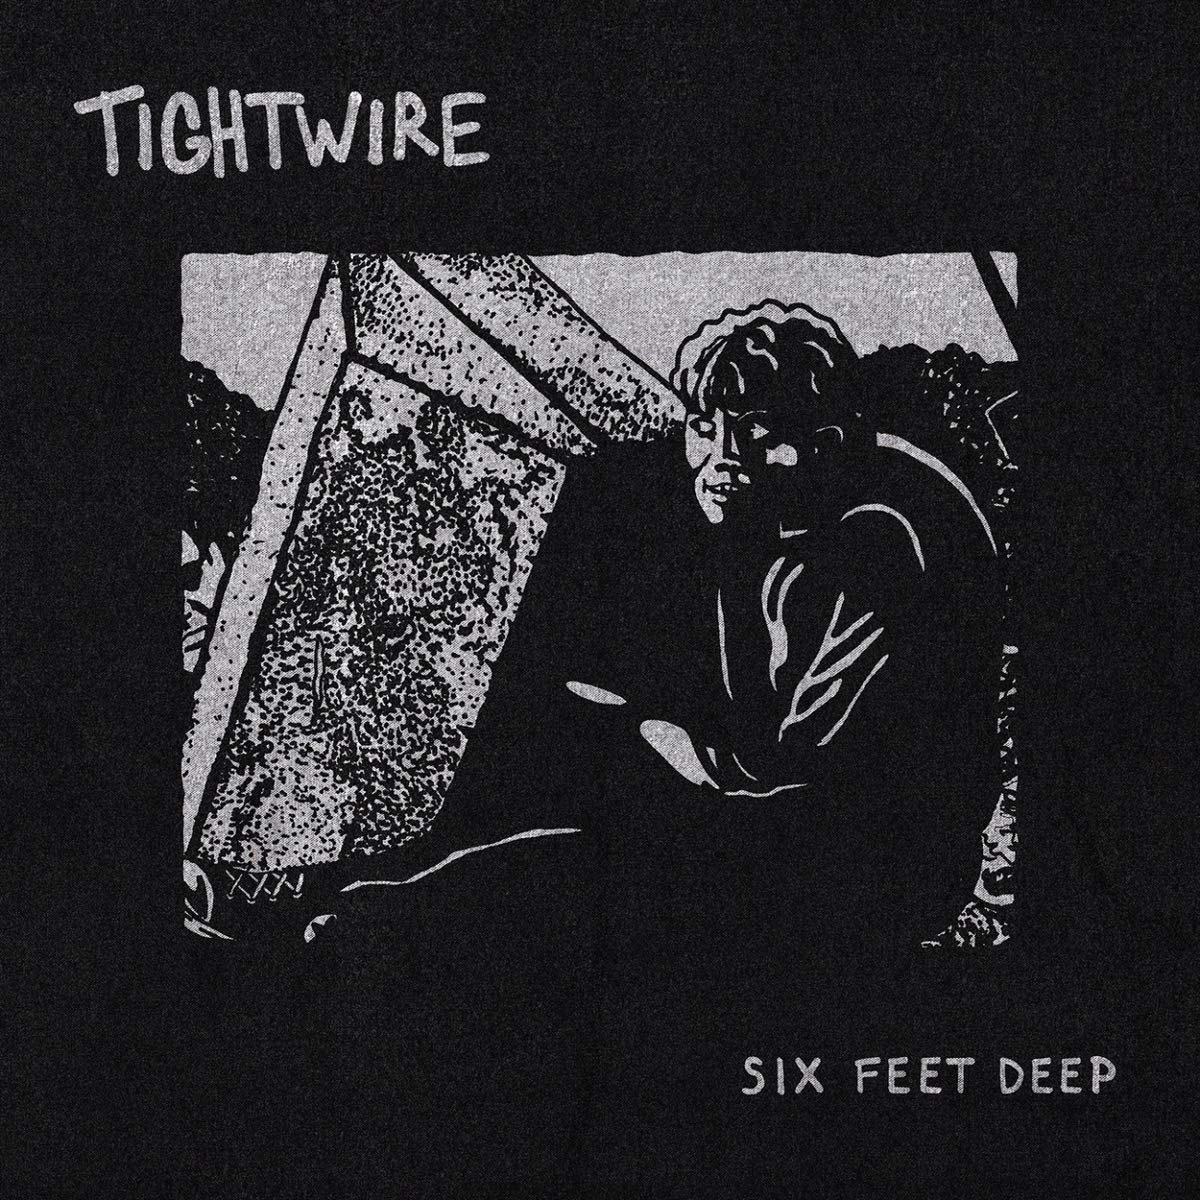 Vinilo : Tightwire - Six Feet Deep (LP Vinyl)